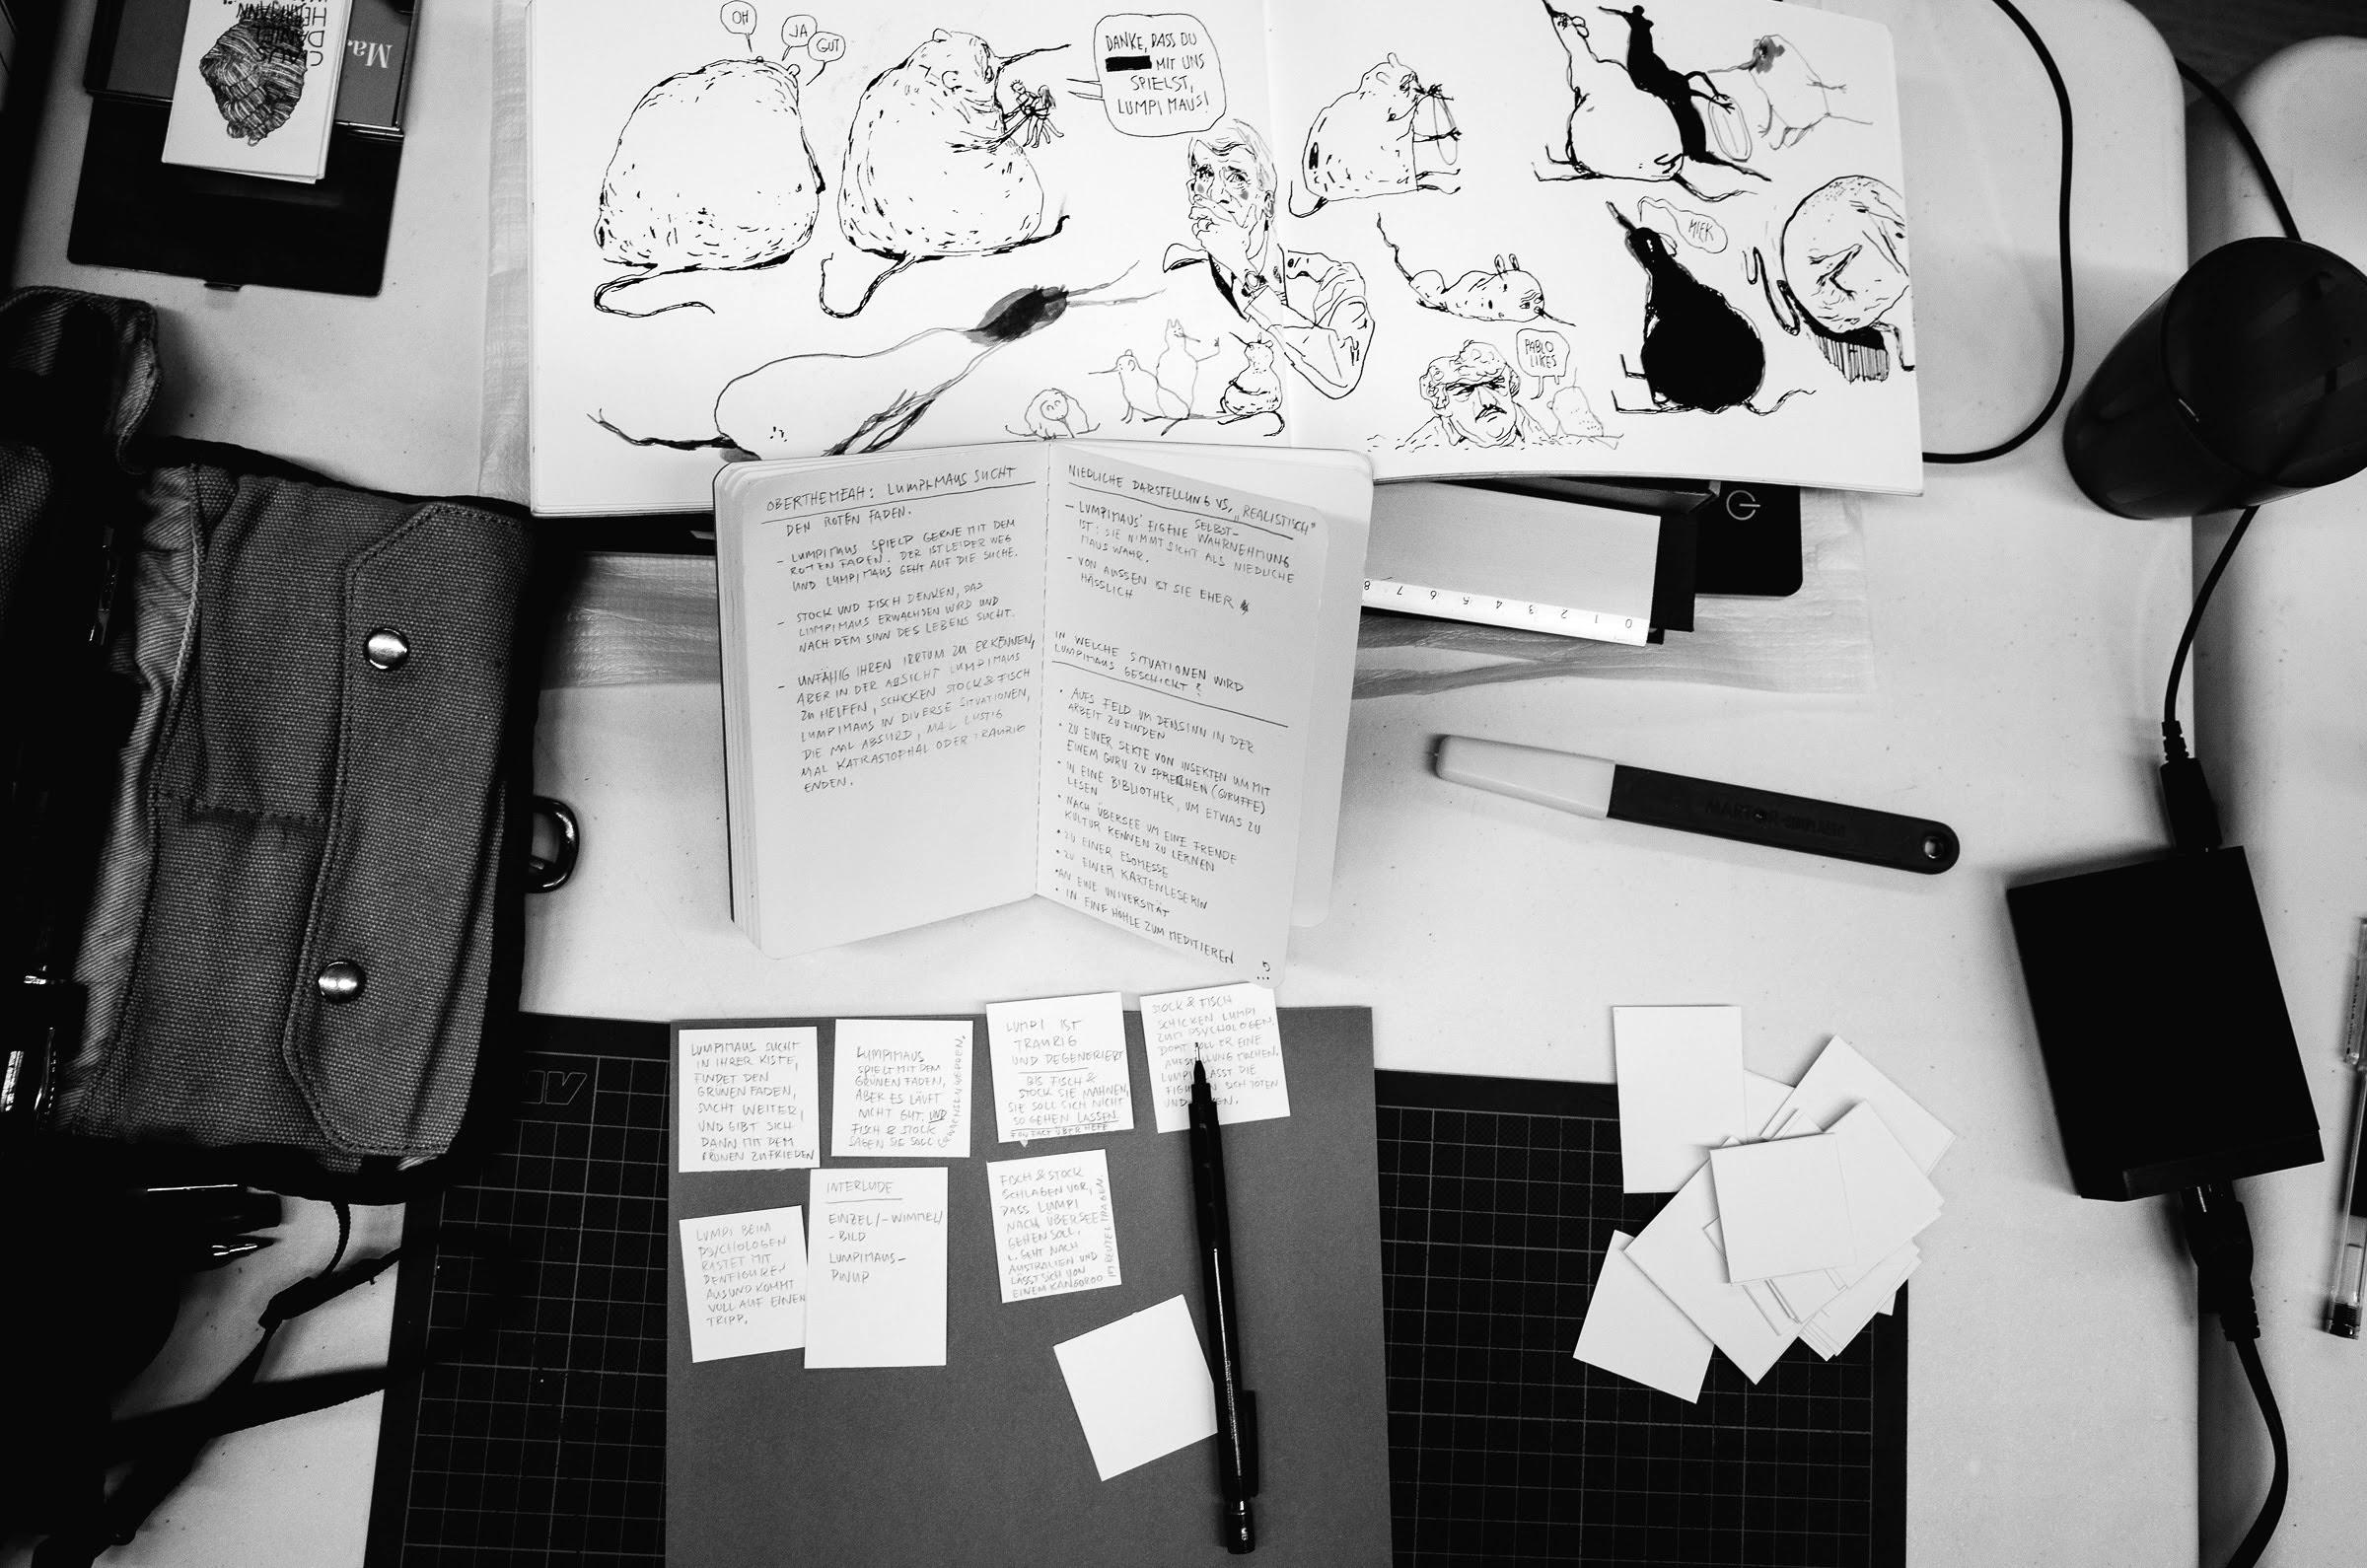 Impressionen vom 24 Stunden Comic-Tag